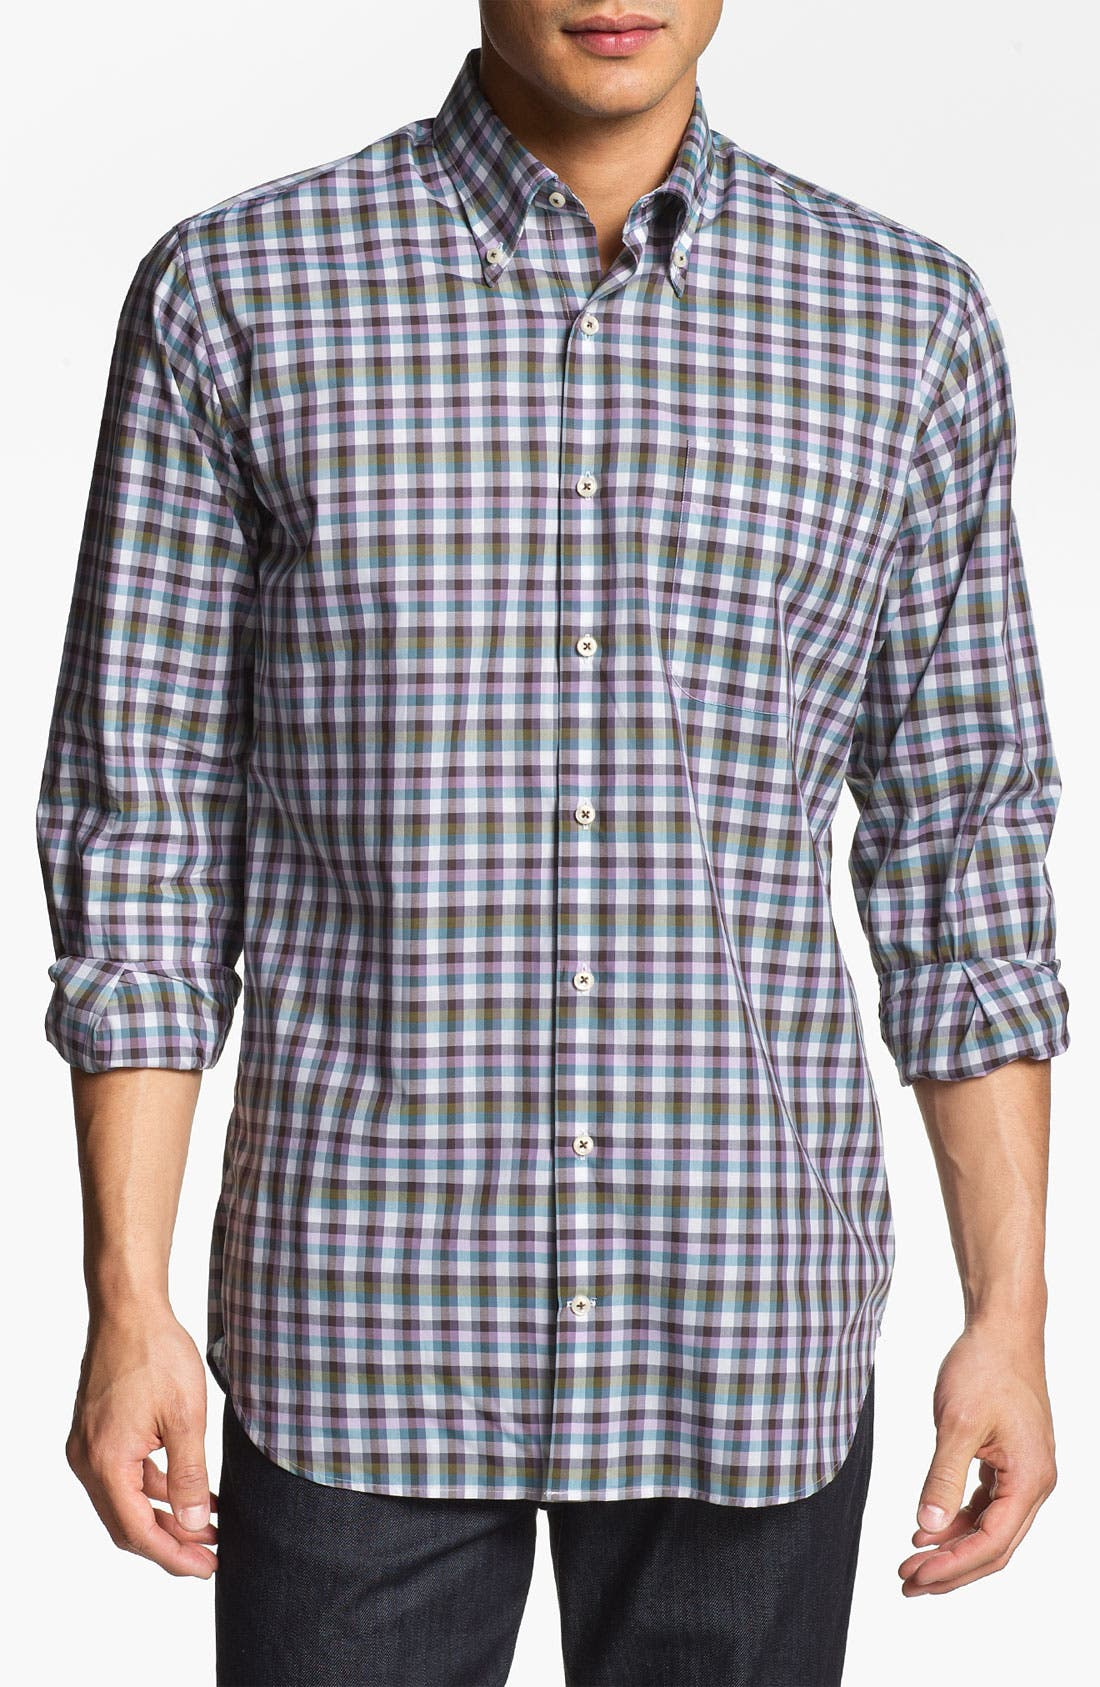 Alternate Image 1 Selected - Peter Millar 'Capri' Regular Fit Sport Shirt (Tall)